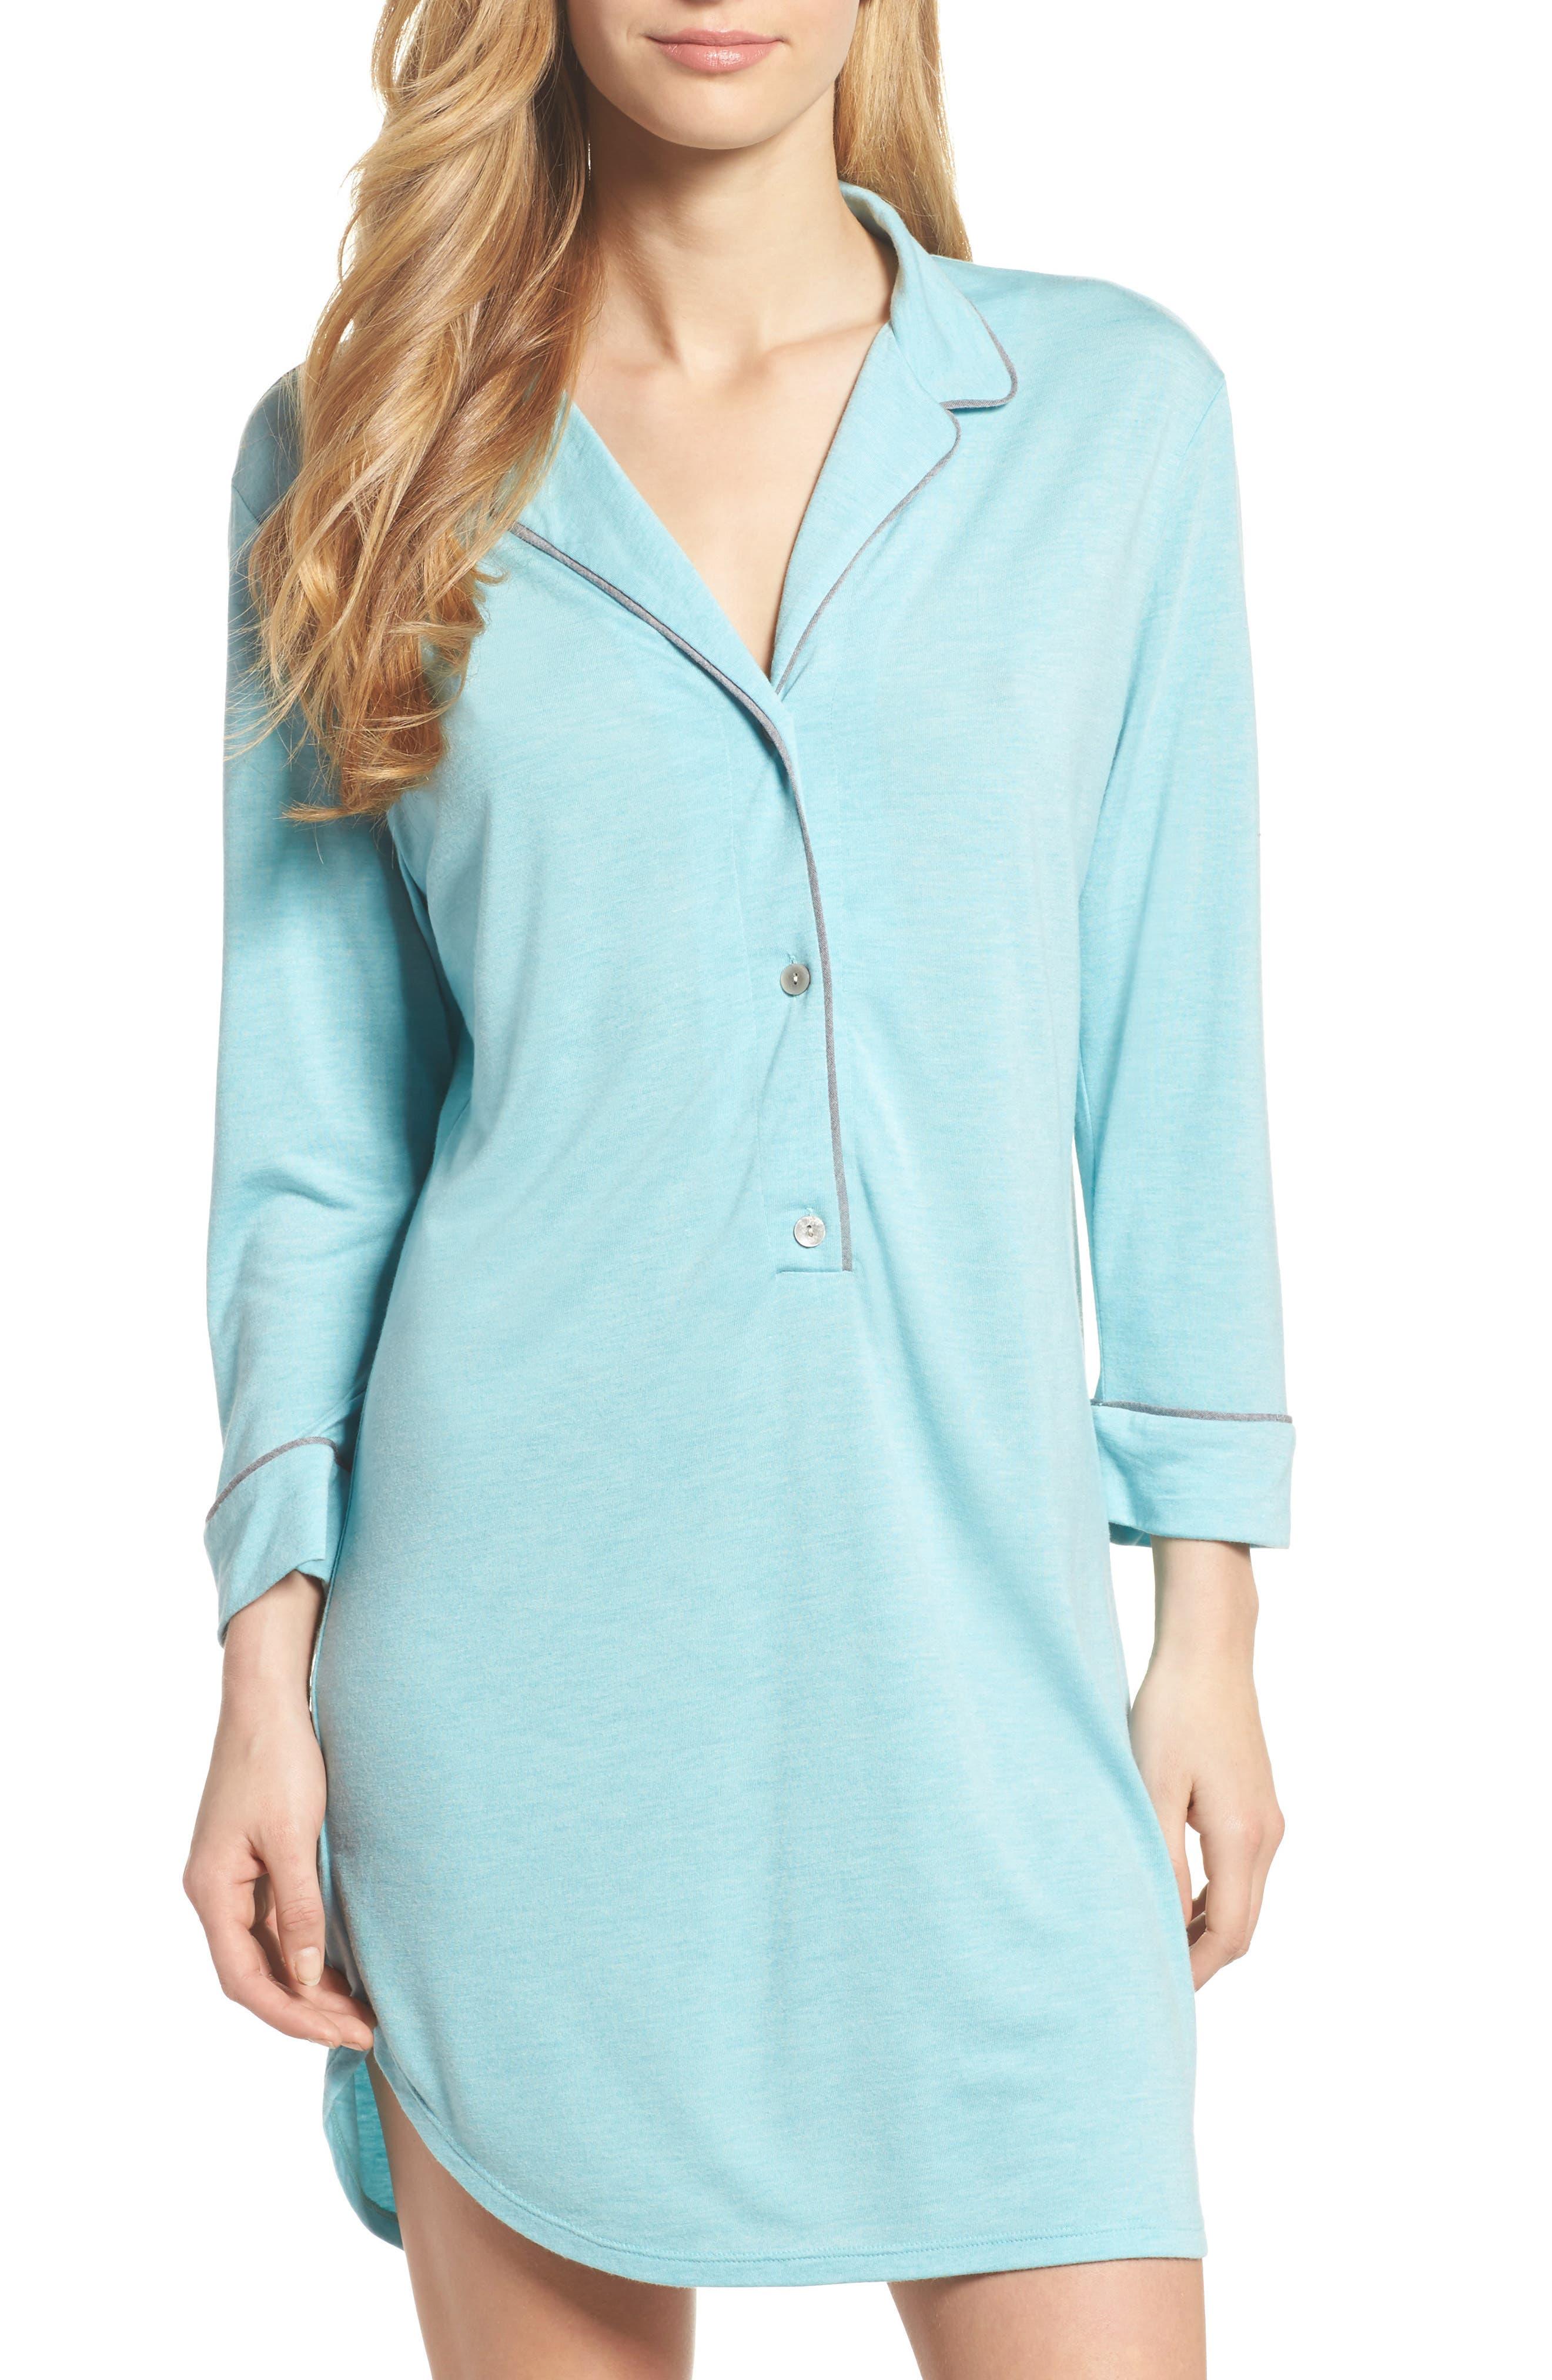 Shangri-La Sleep Shirt,                             Main thumbnail 1, color,                             Turquoise